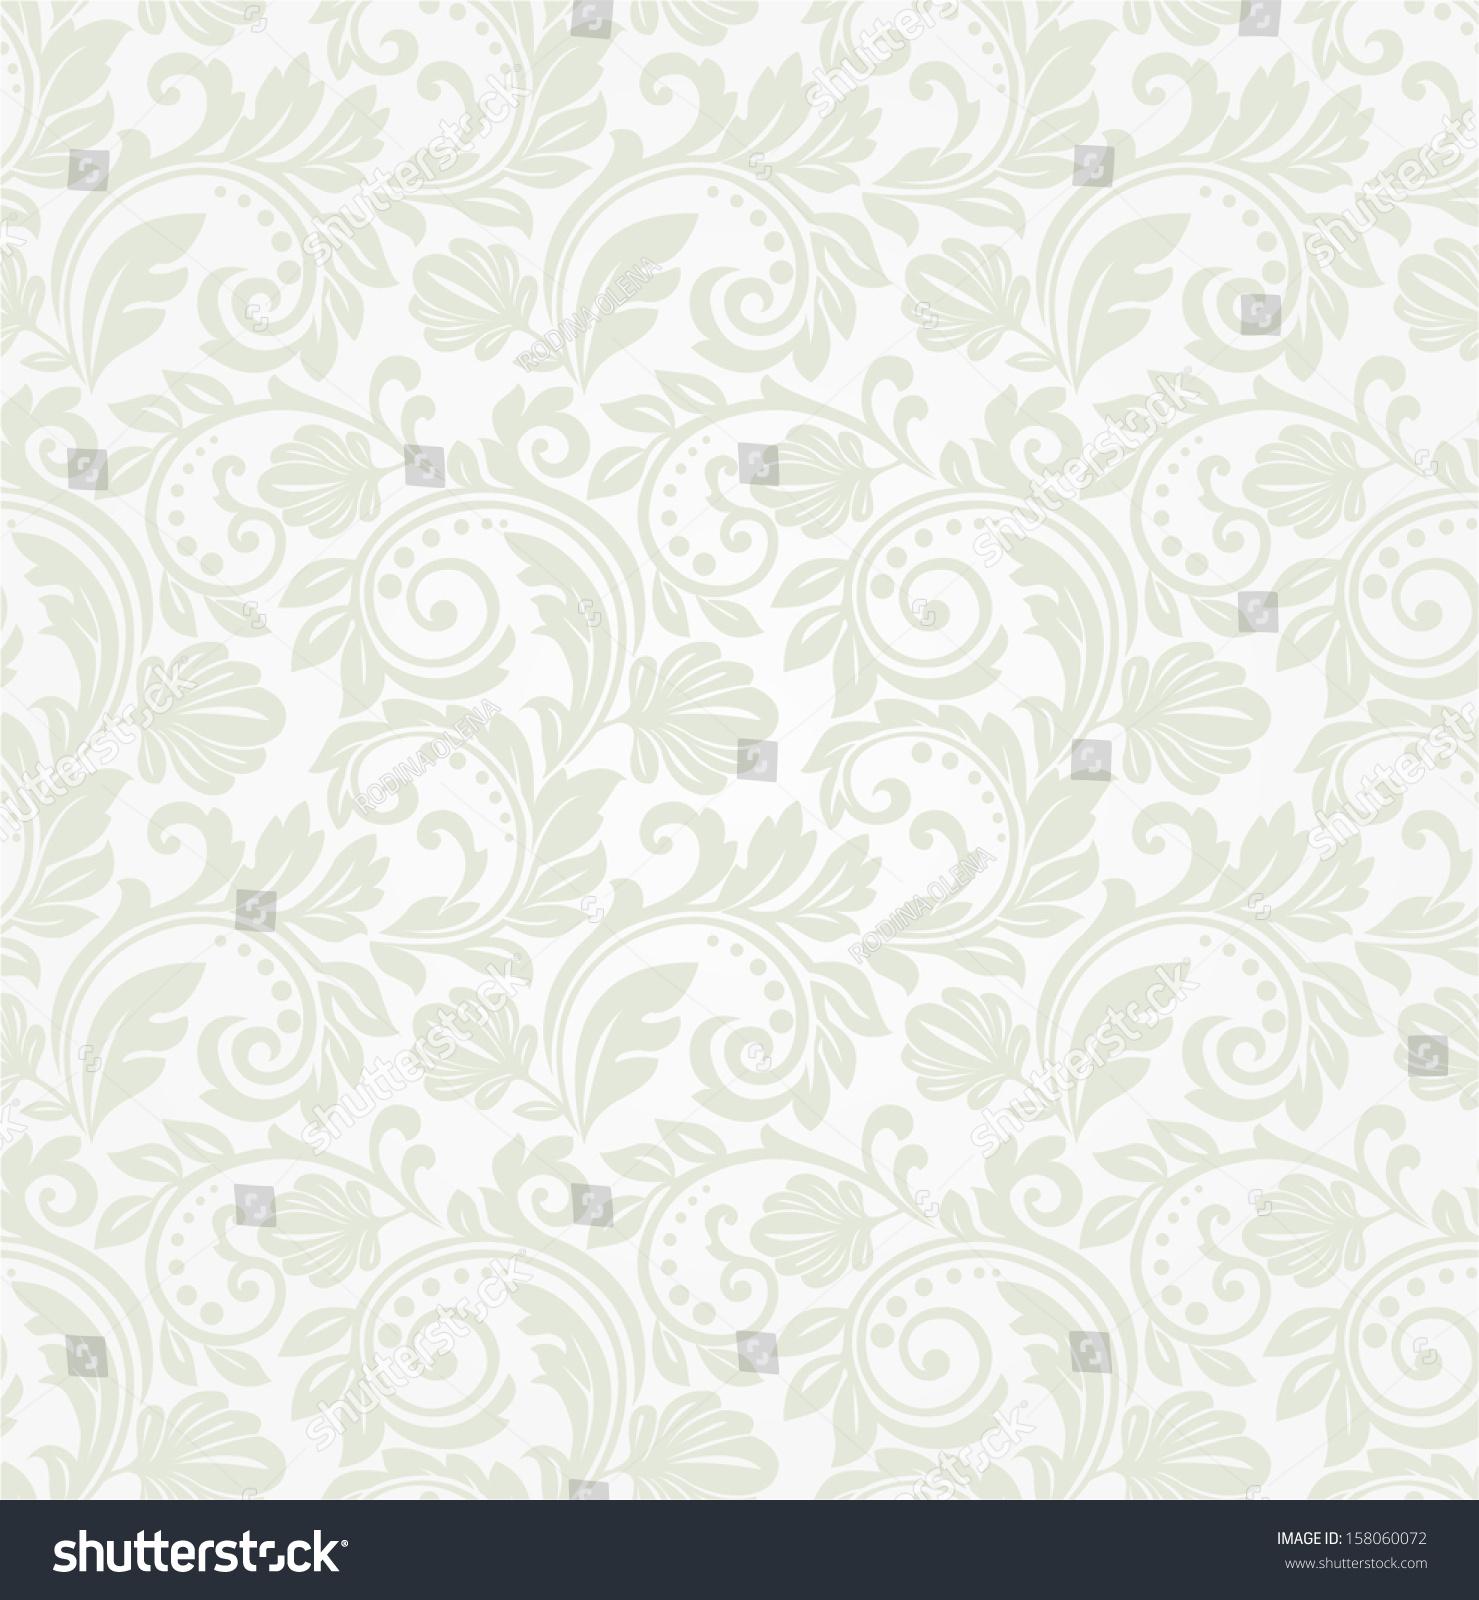 Edit Vectors Free Online - Floral pattern.   Shutterstock